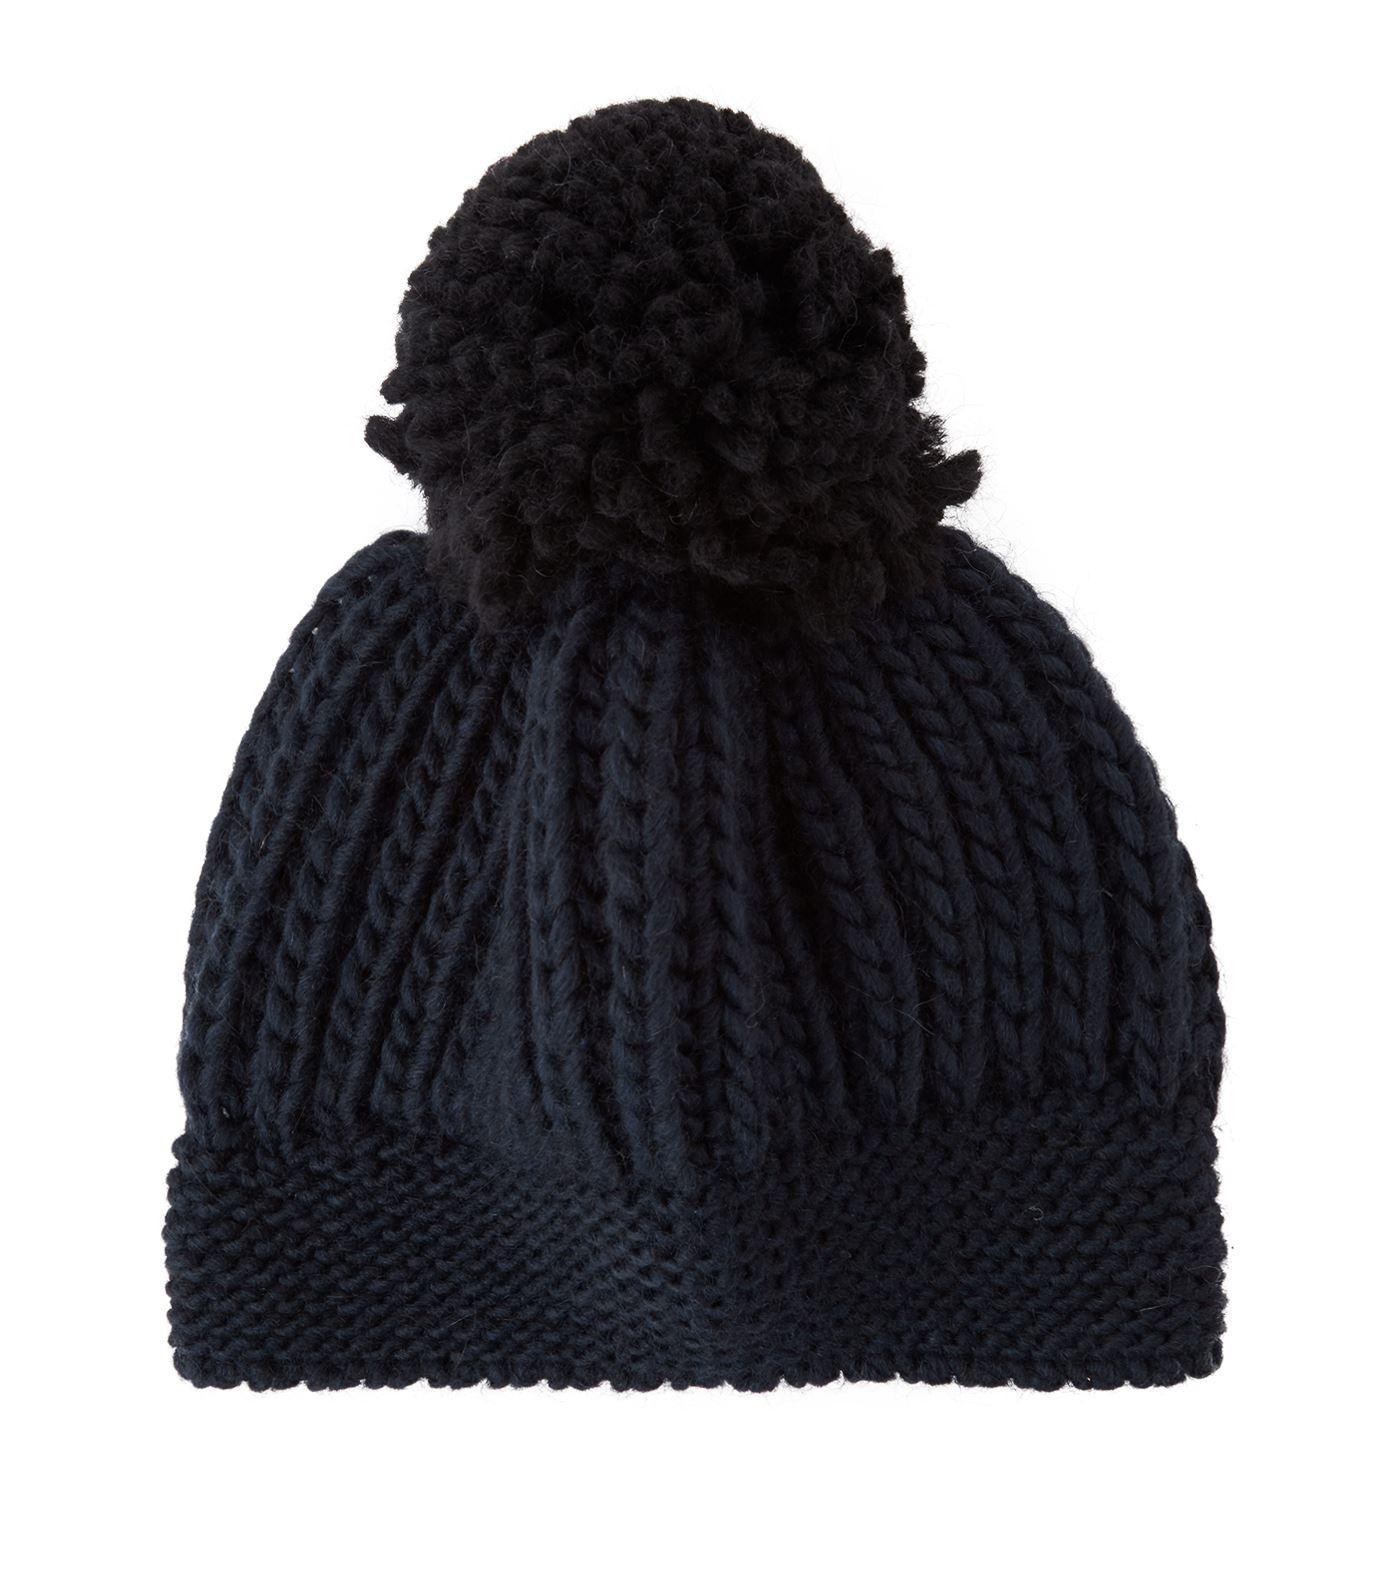 29c0a2a67f3 Lyst - Sandro Beryl Pom Pom Beanie Hat in Blue